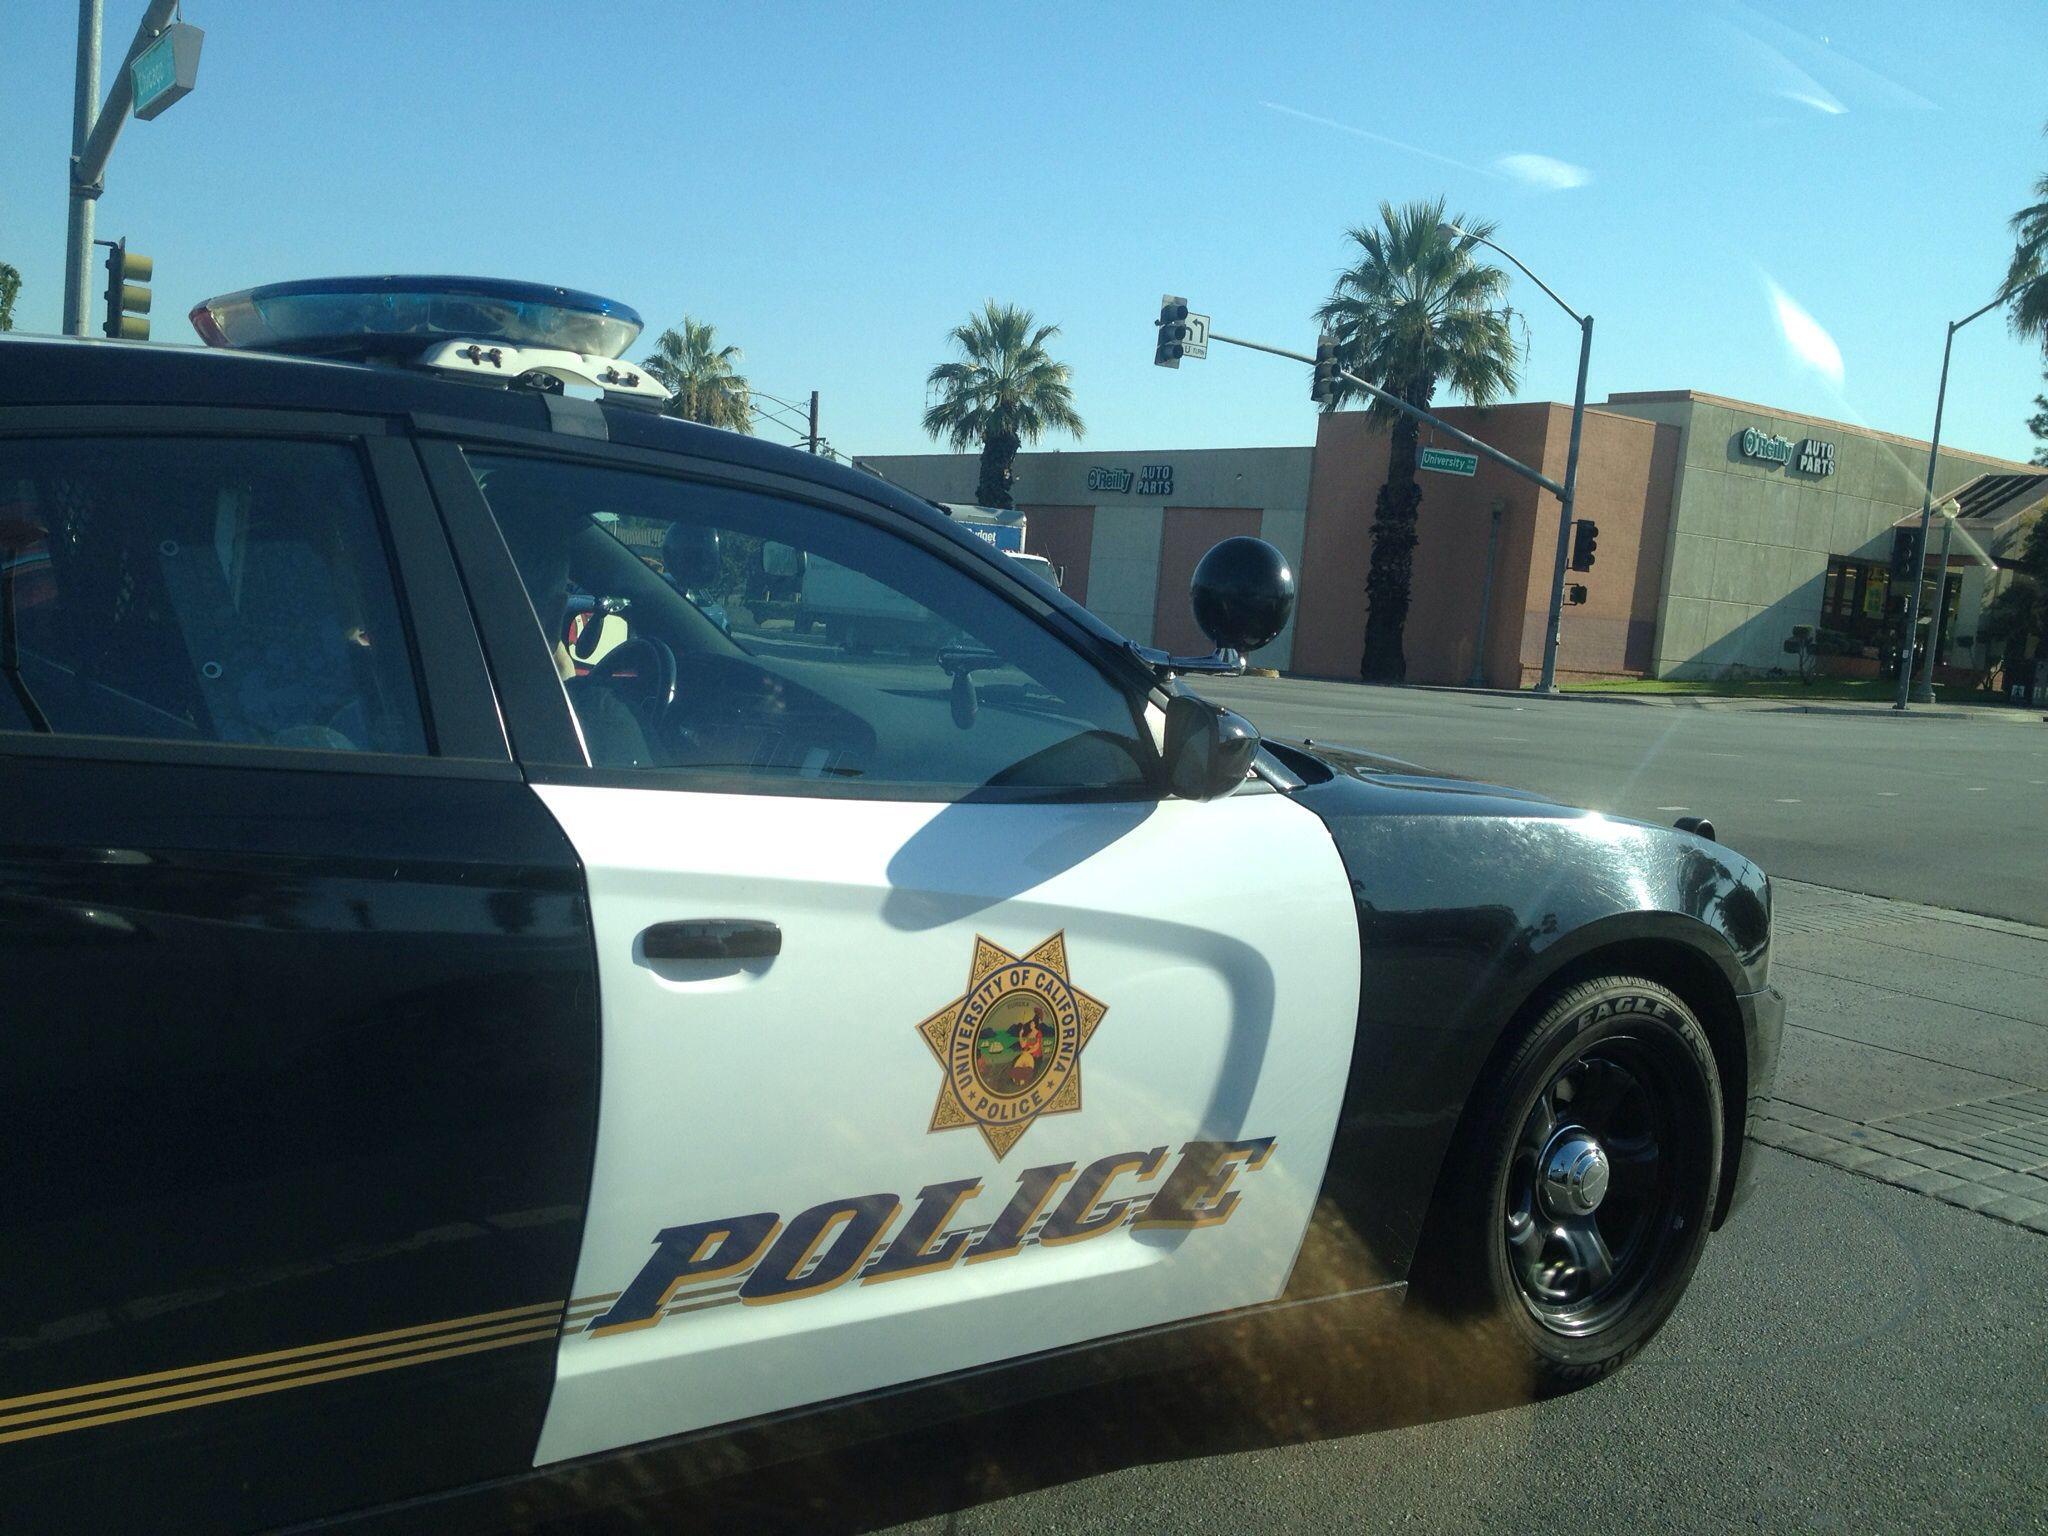 Uc riverside police